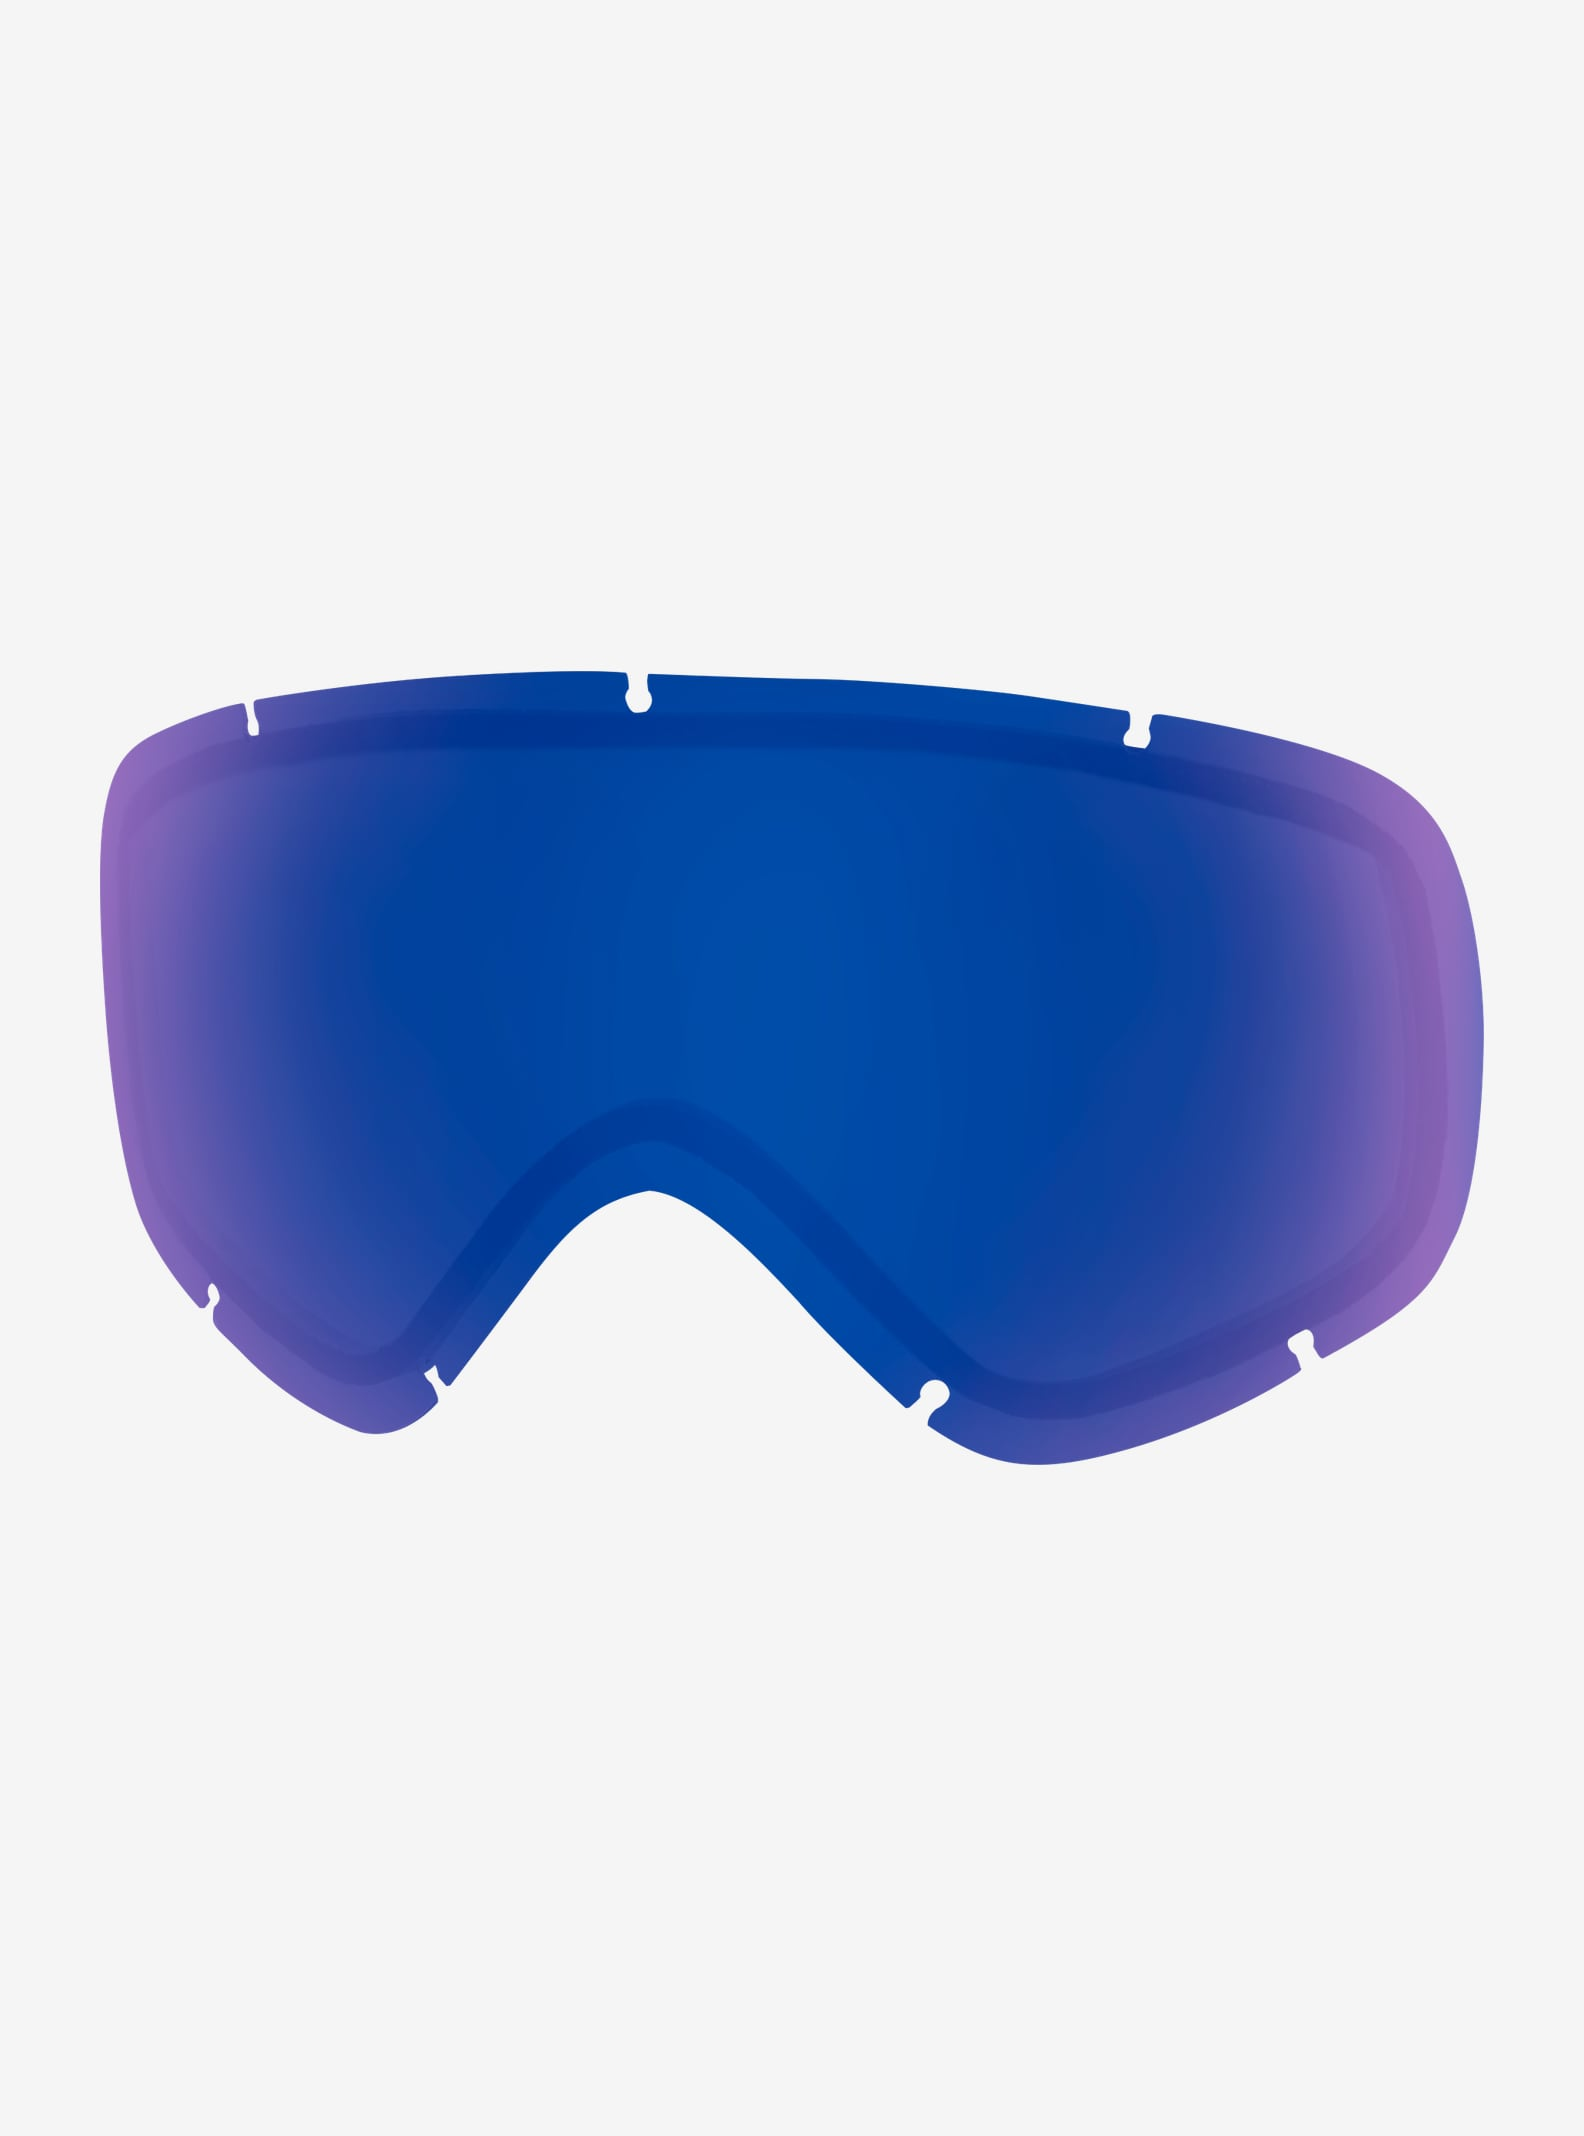 anon. Helix 2.0 Goggle Lens shown in Blue Cobalt (6% VLT)